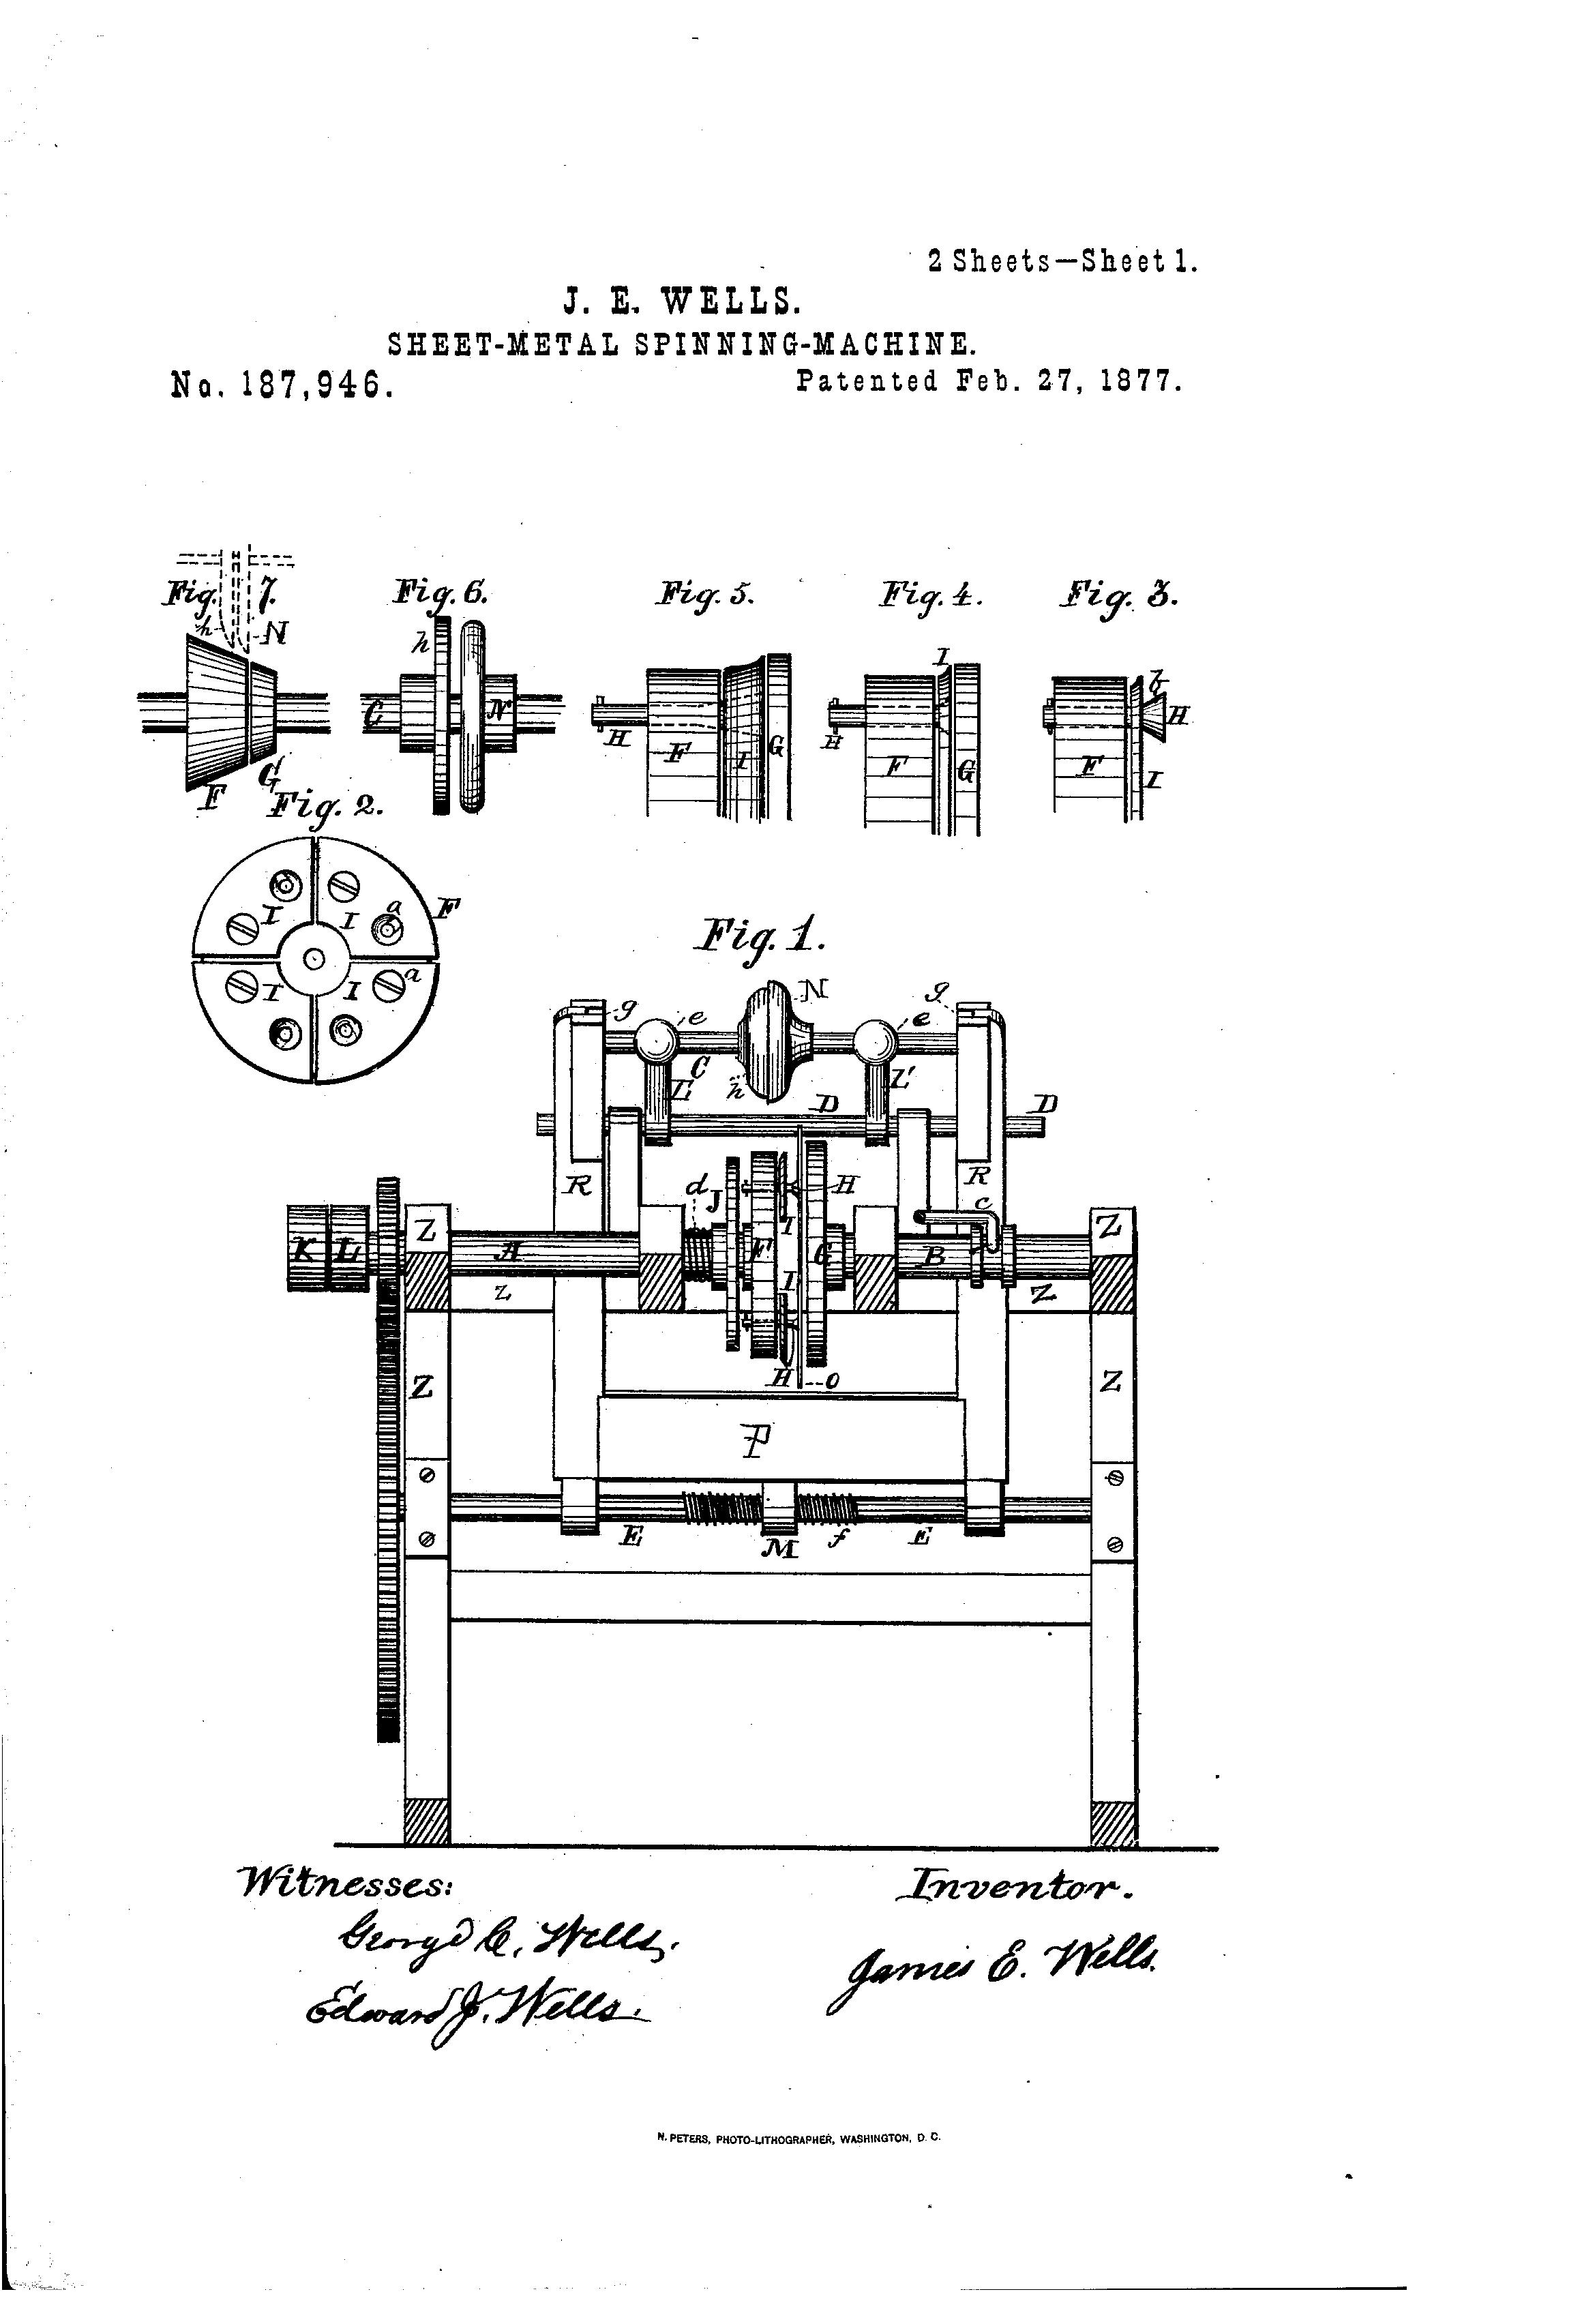 Brevet Us187946 Improvement In Sheet Metal Spinning Machines